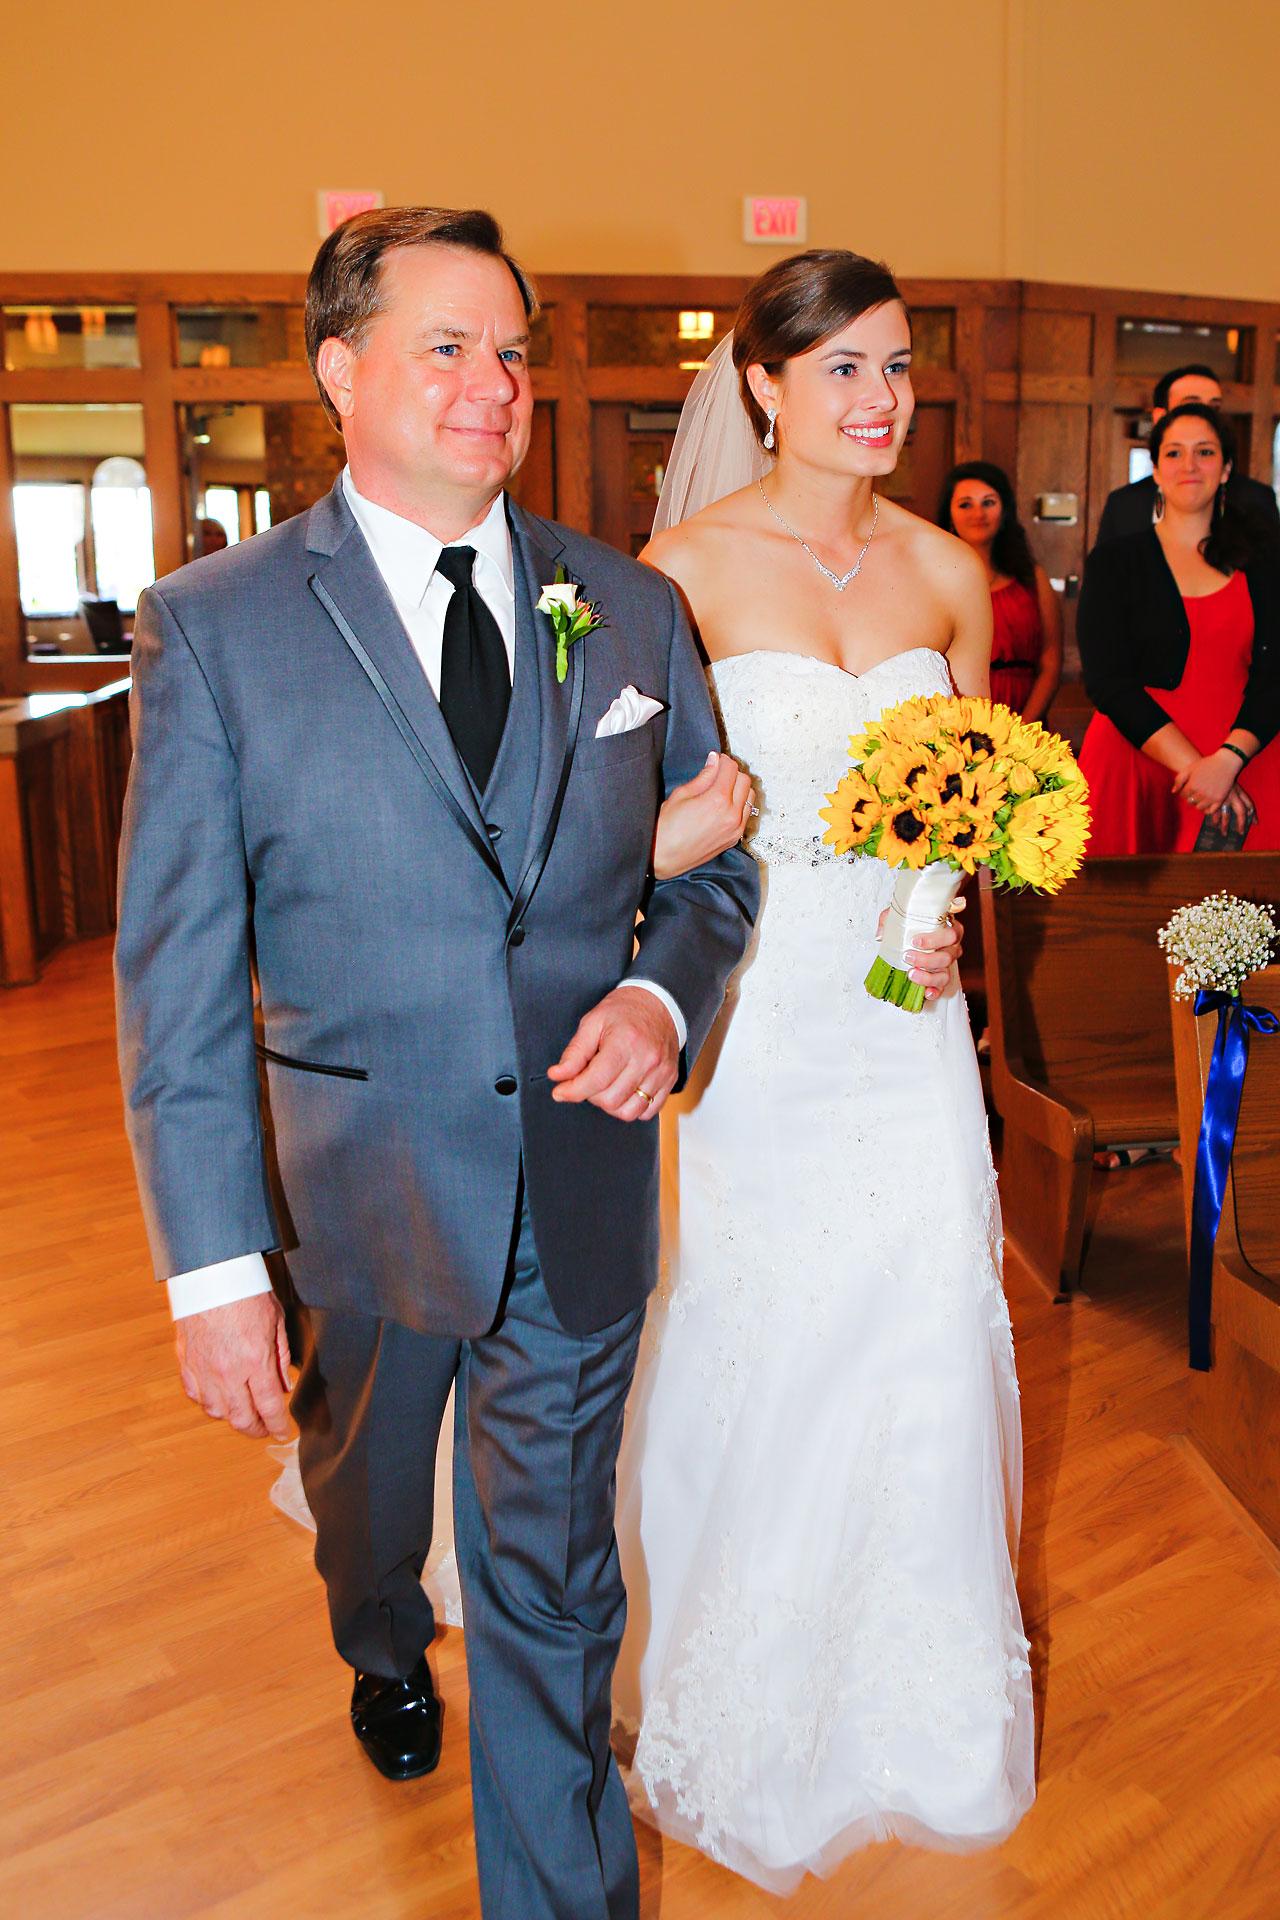 Gail Ben Oak Hill Mansion Wedding 070